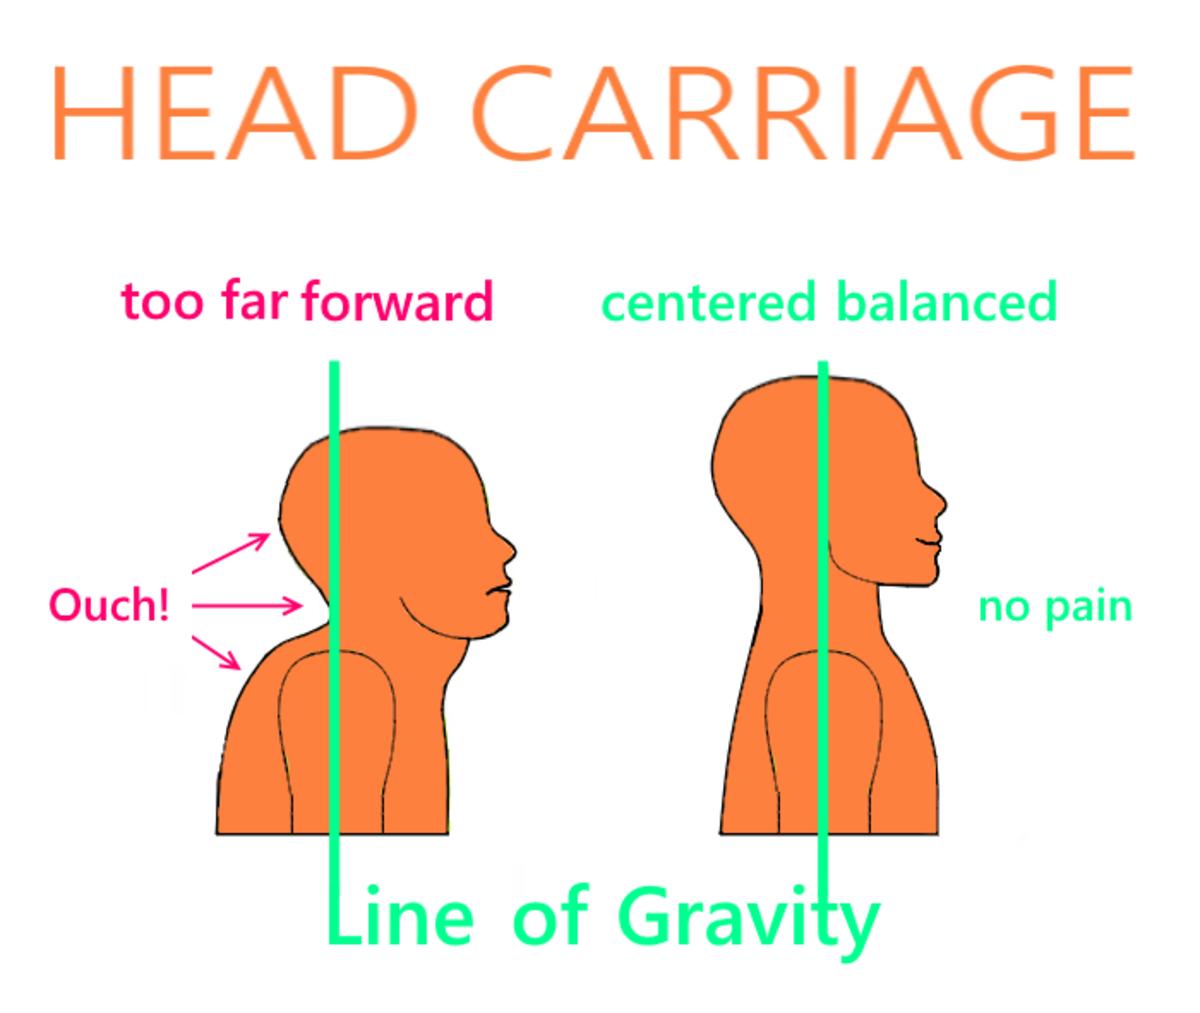 how-to-treat-a-stiff-neck